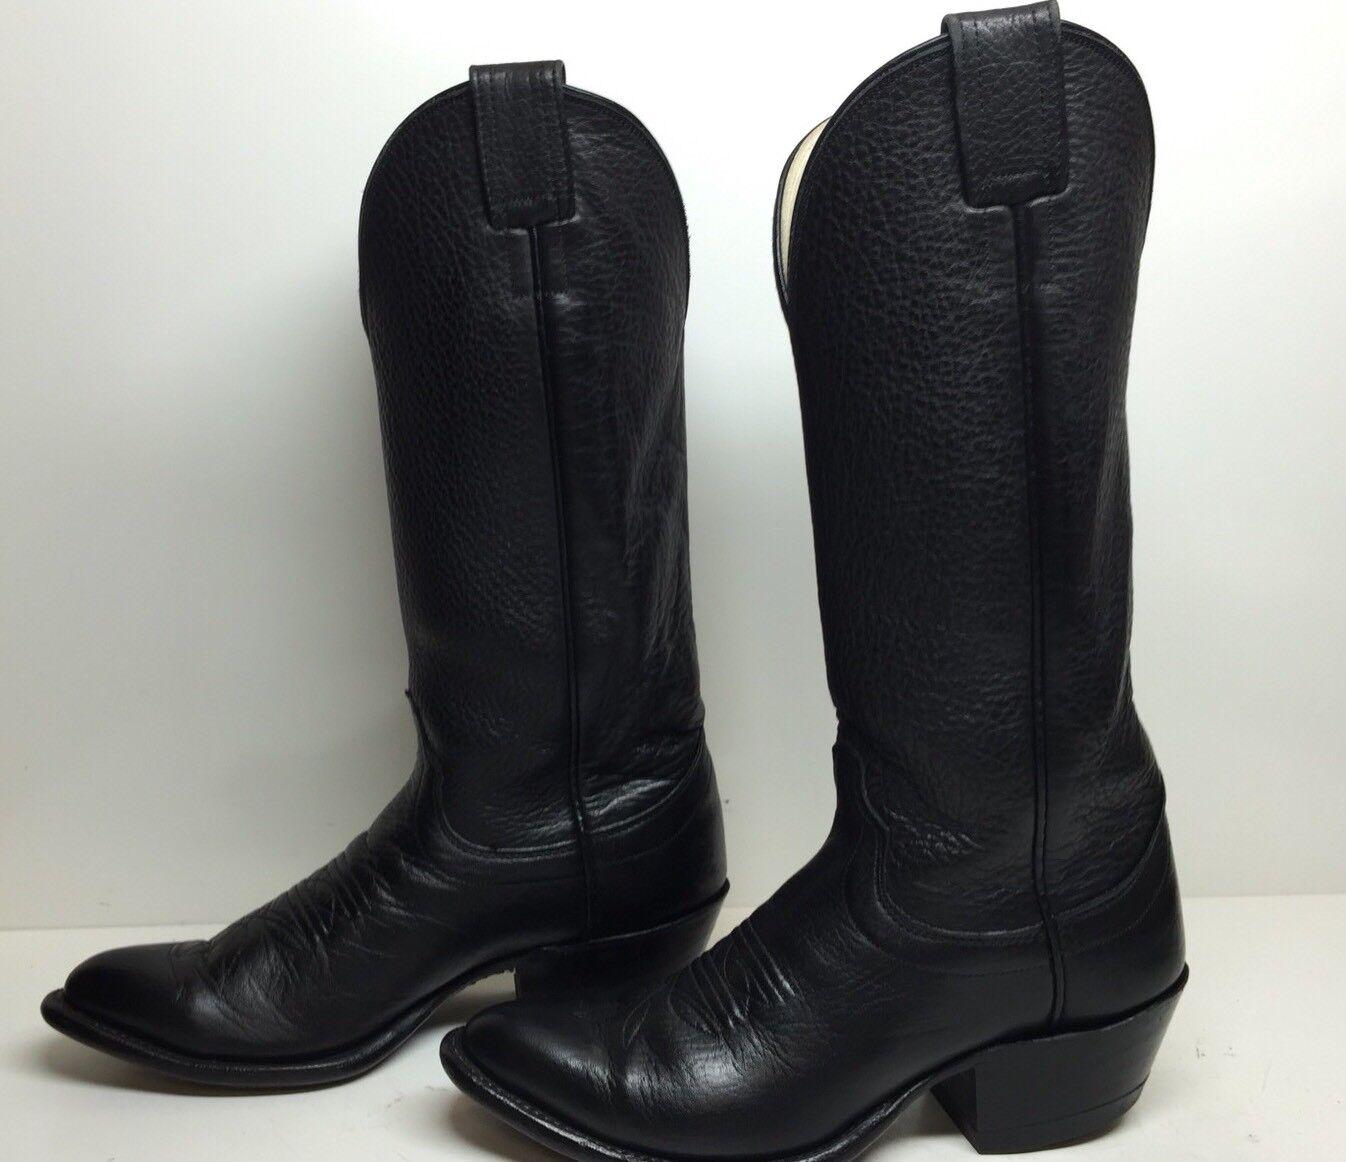 #J  WOMENS OLATHE COWBOY BULLHIDE LEATHER BLACK BOOTS SIZE 6.5 B